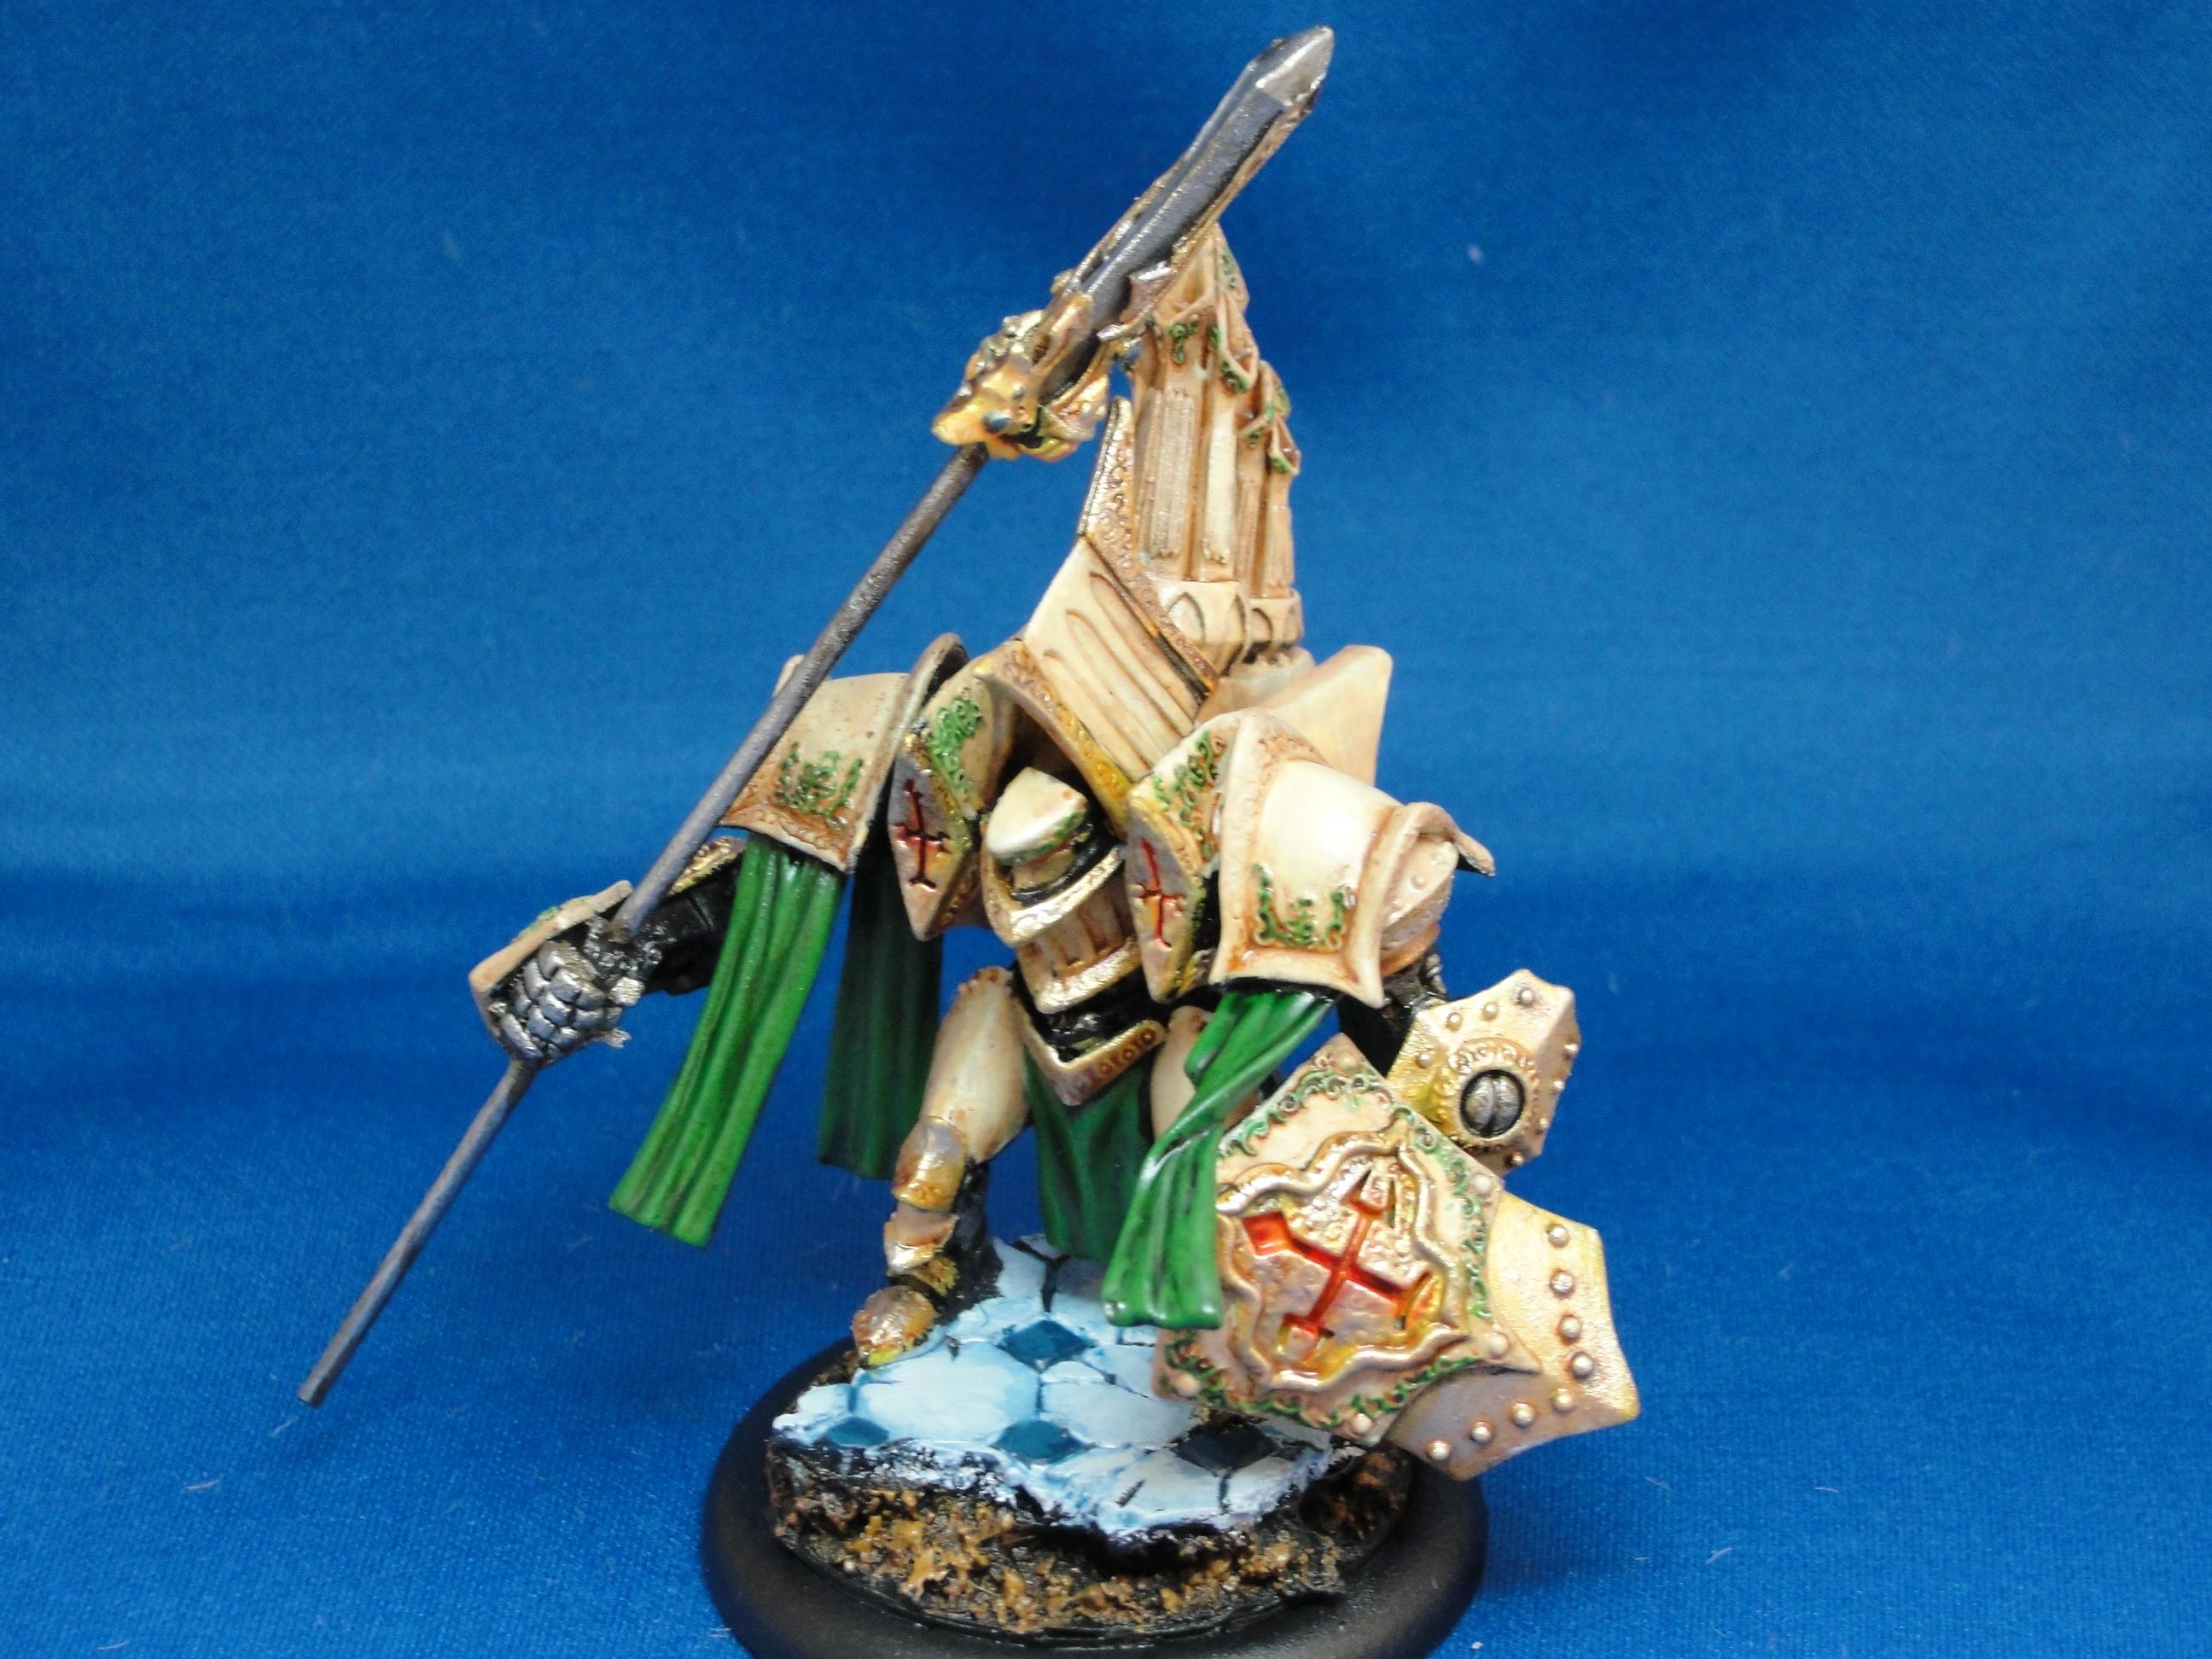 Warmachine, Protectorate of Menoth, Warjack, Avatar of Menoth